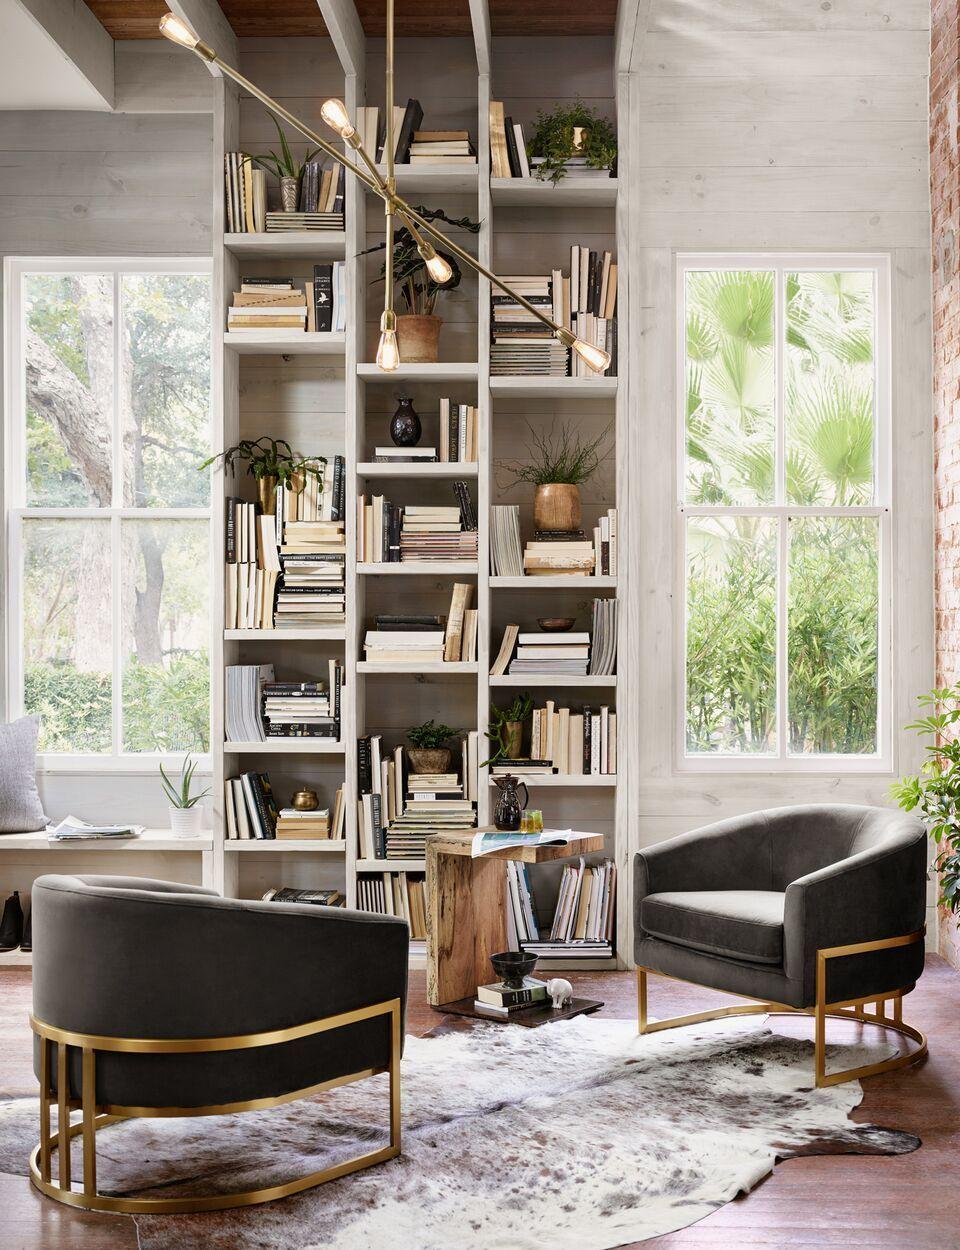 Corbin Chair Bella Smoke In 2019 Furniture Four Hands Furniture